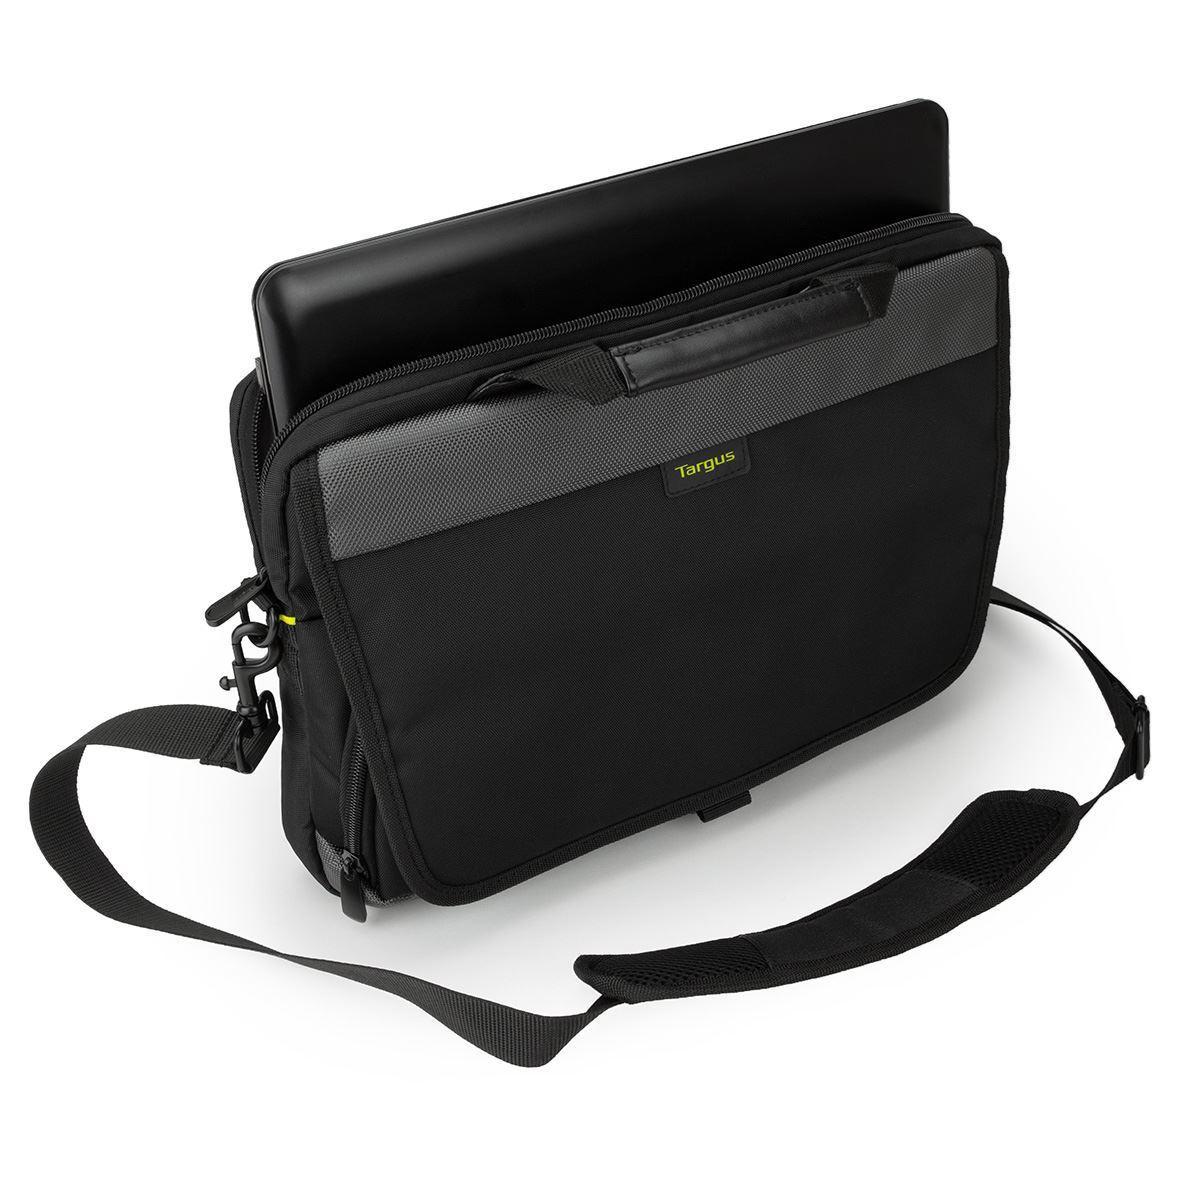 "Picture of CityGear 15-15.6"" Slim Topload Laptop Case - Black"